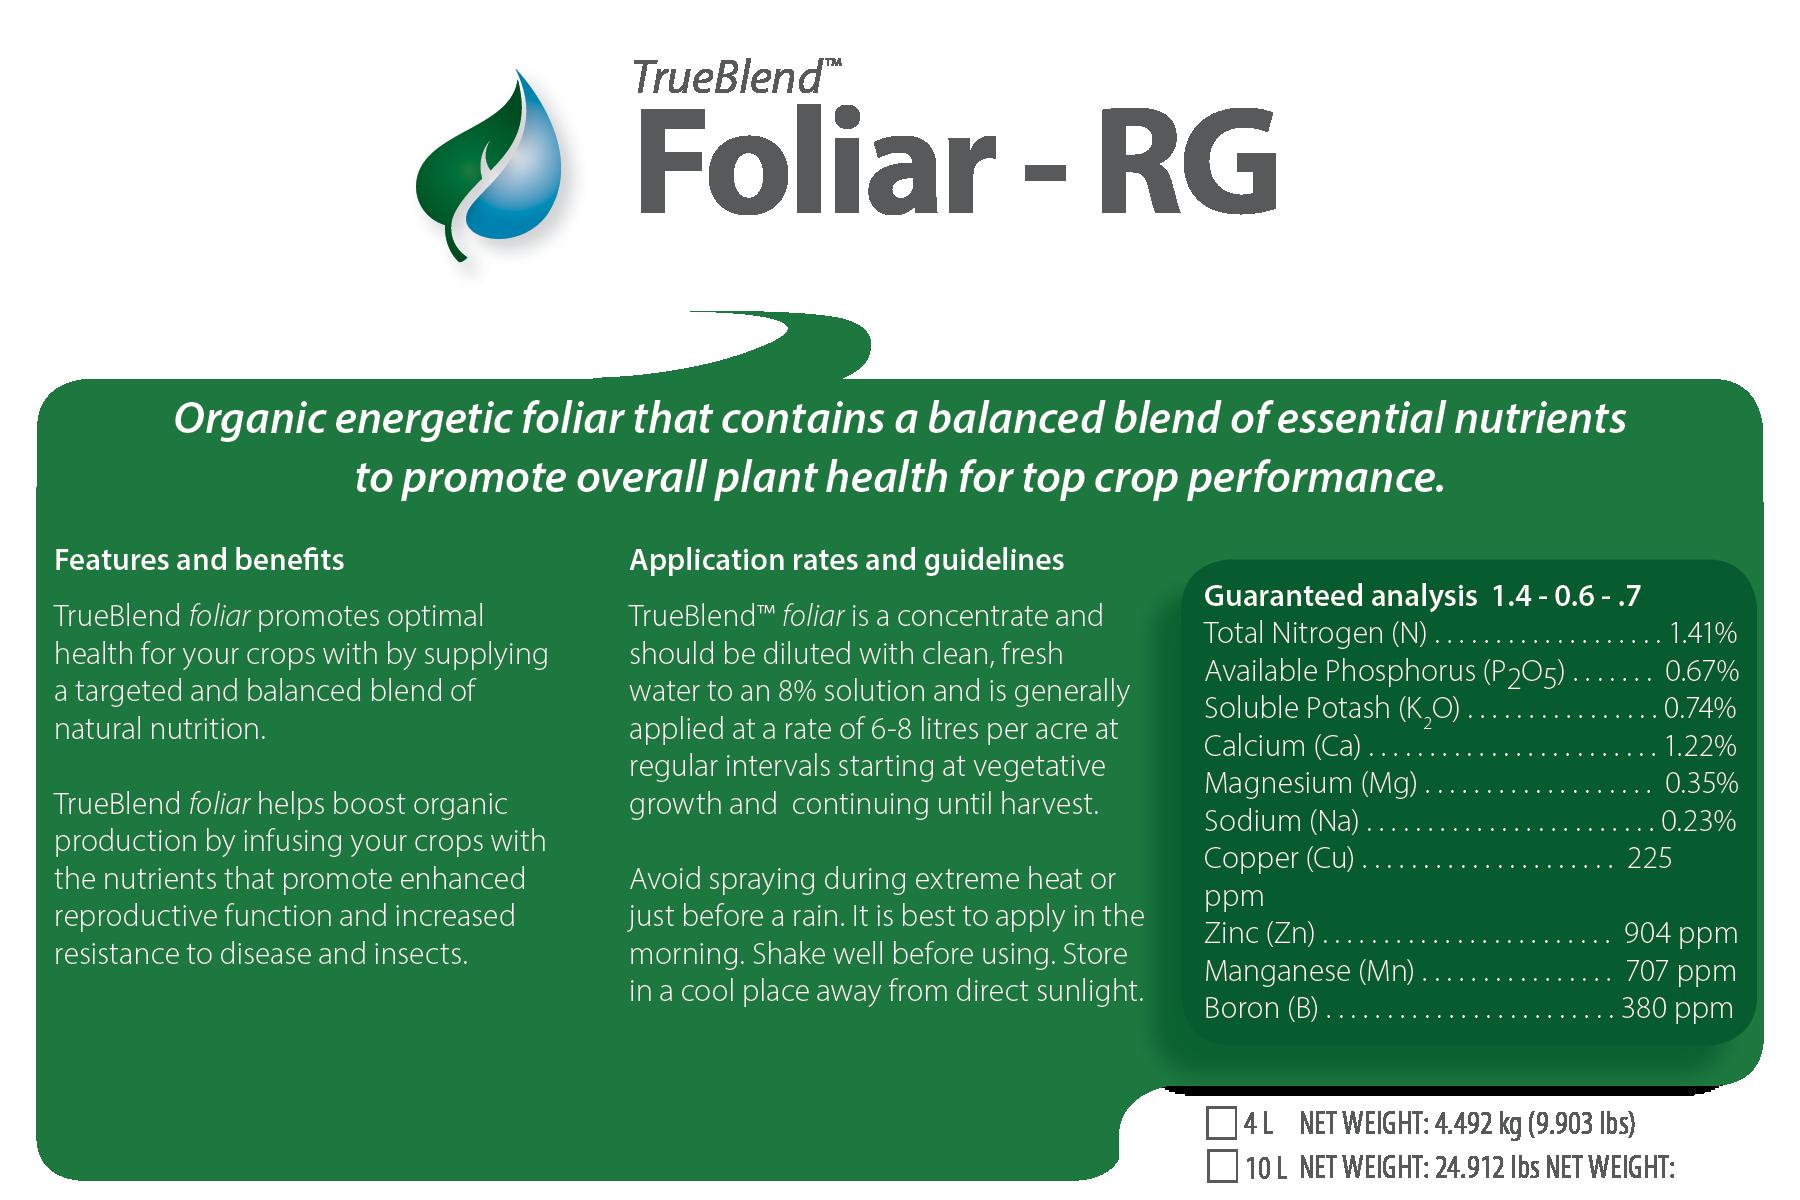 TrueBlend Foliar RG